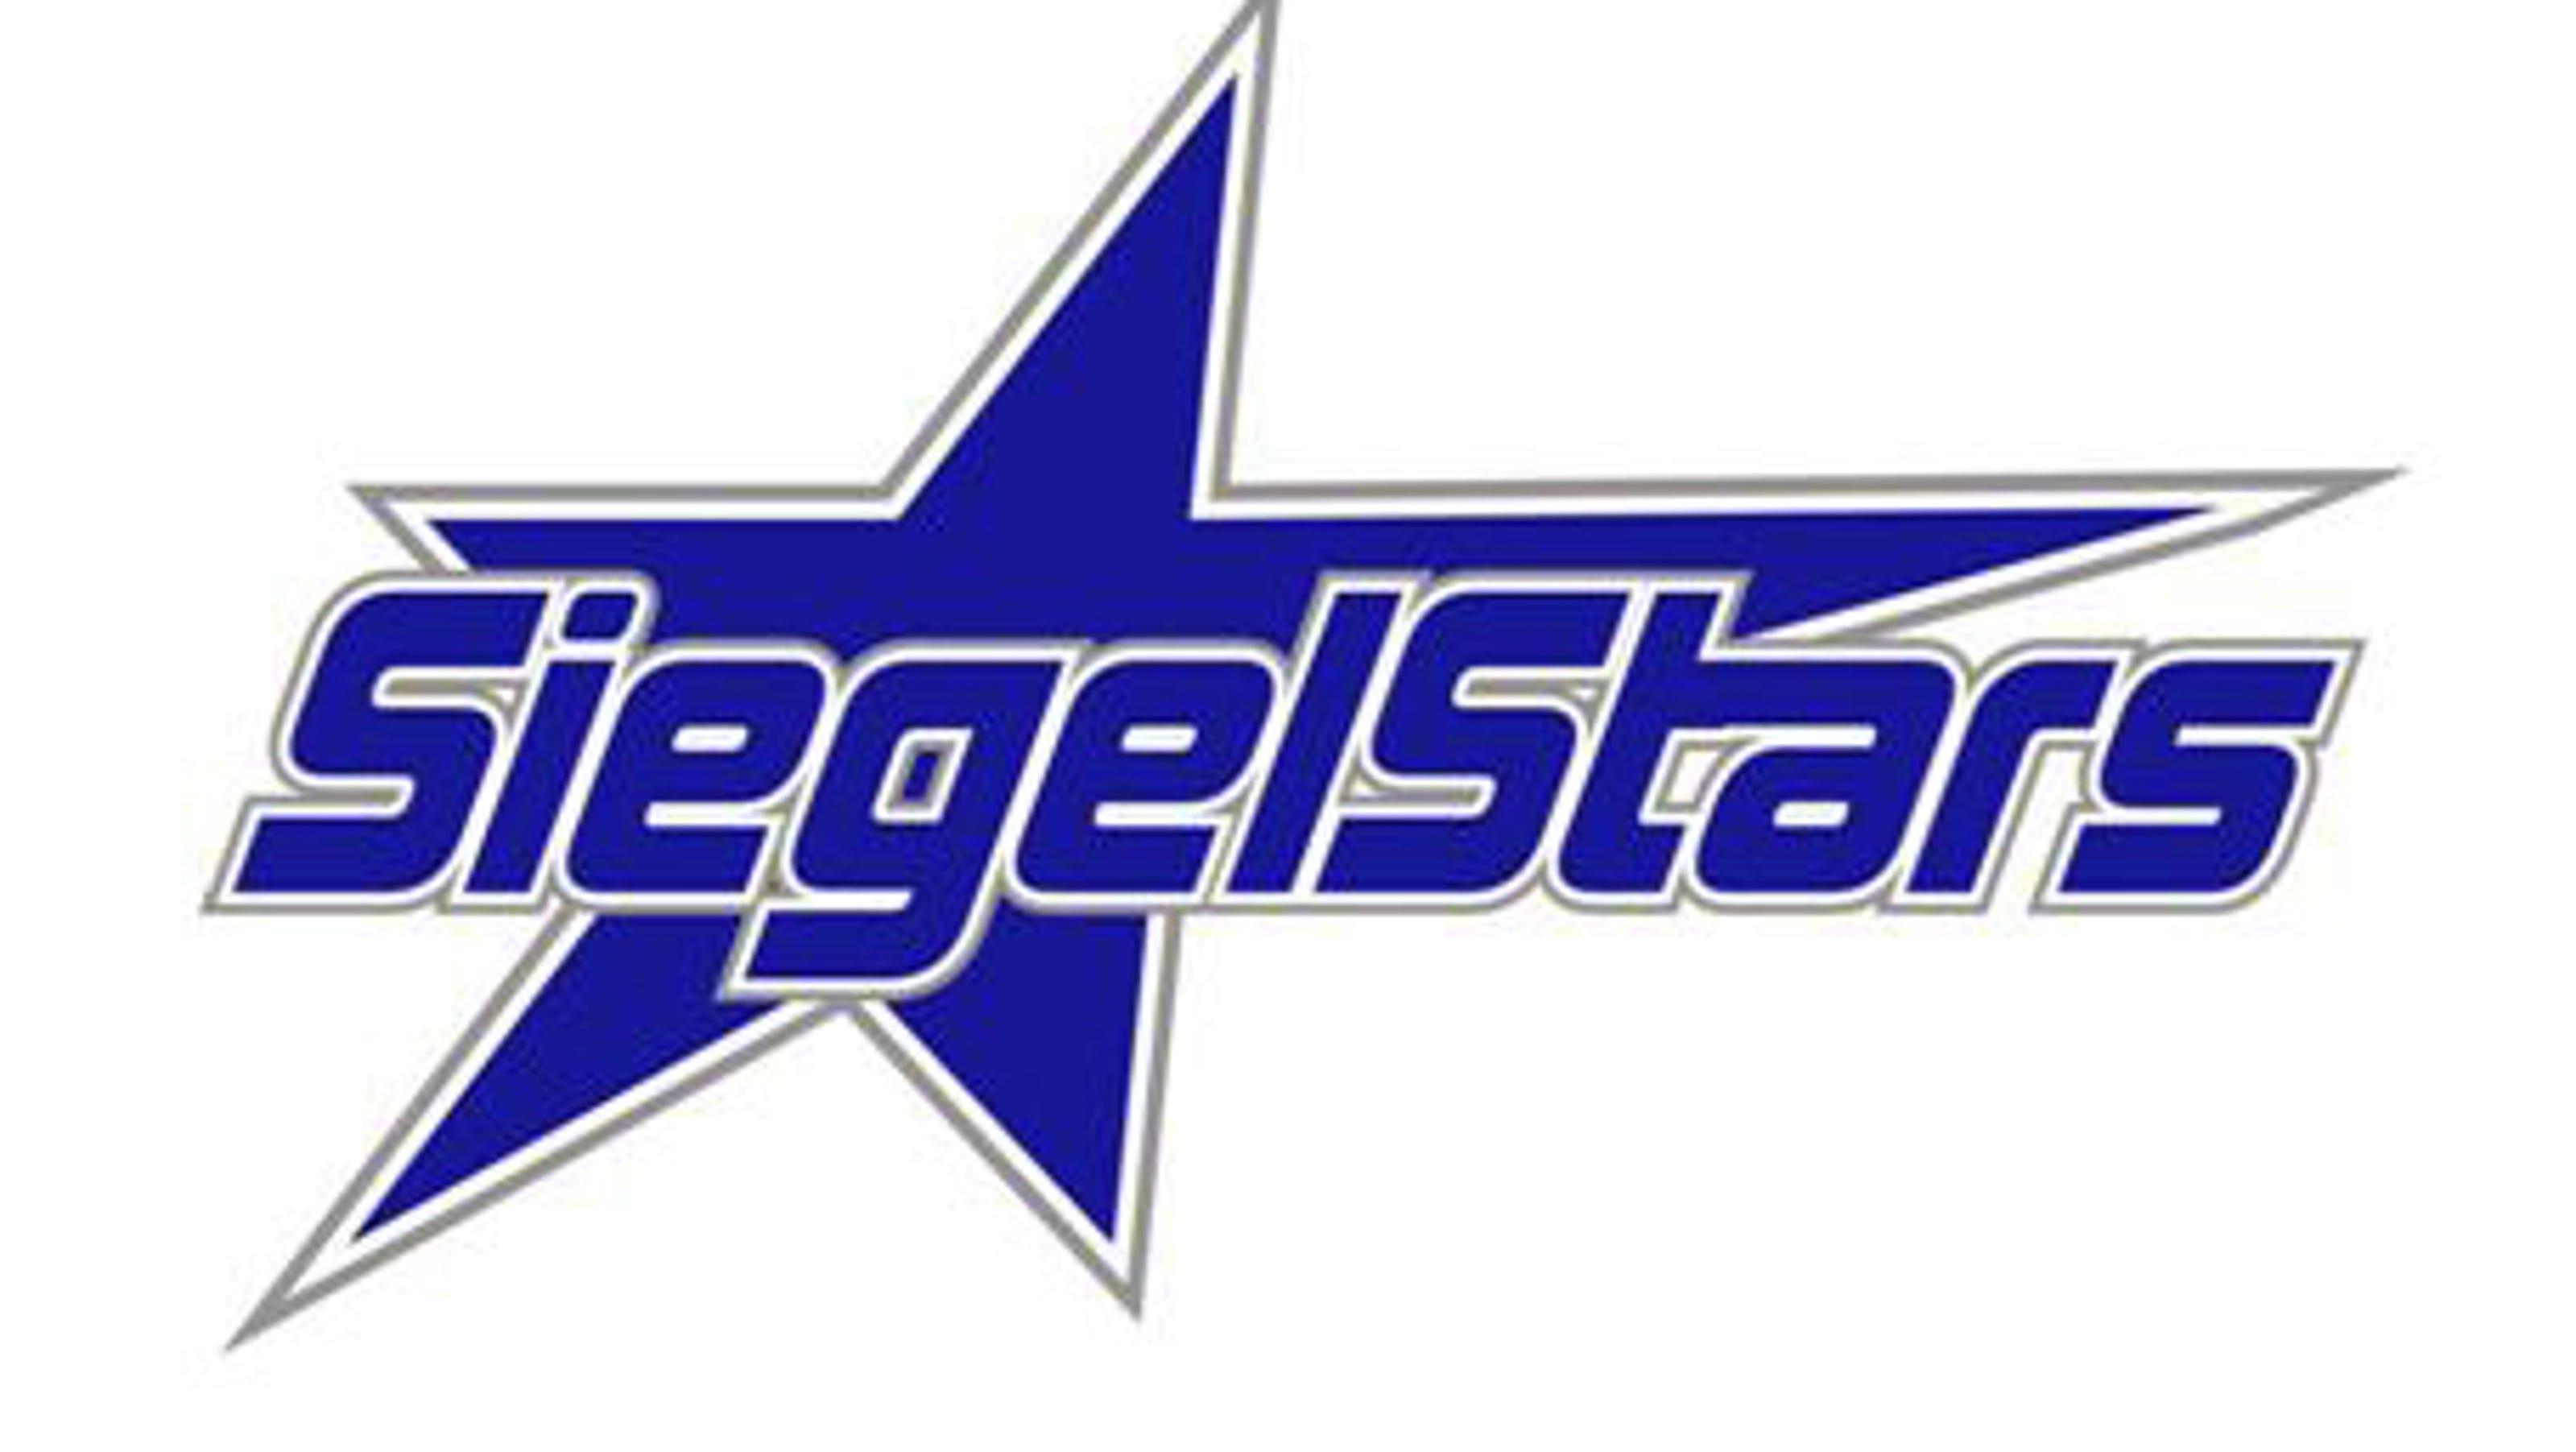 1406601960000-Siegel-Stars-logo jpgUsa Today Sports Media Group Logo